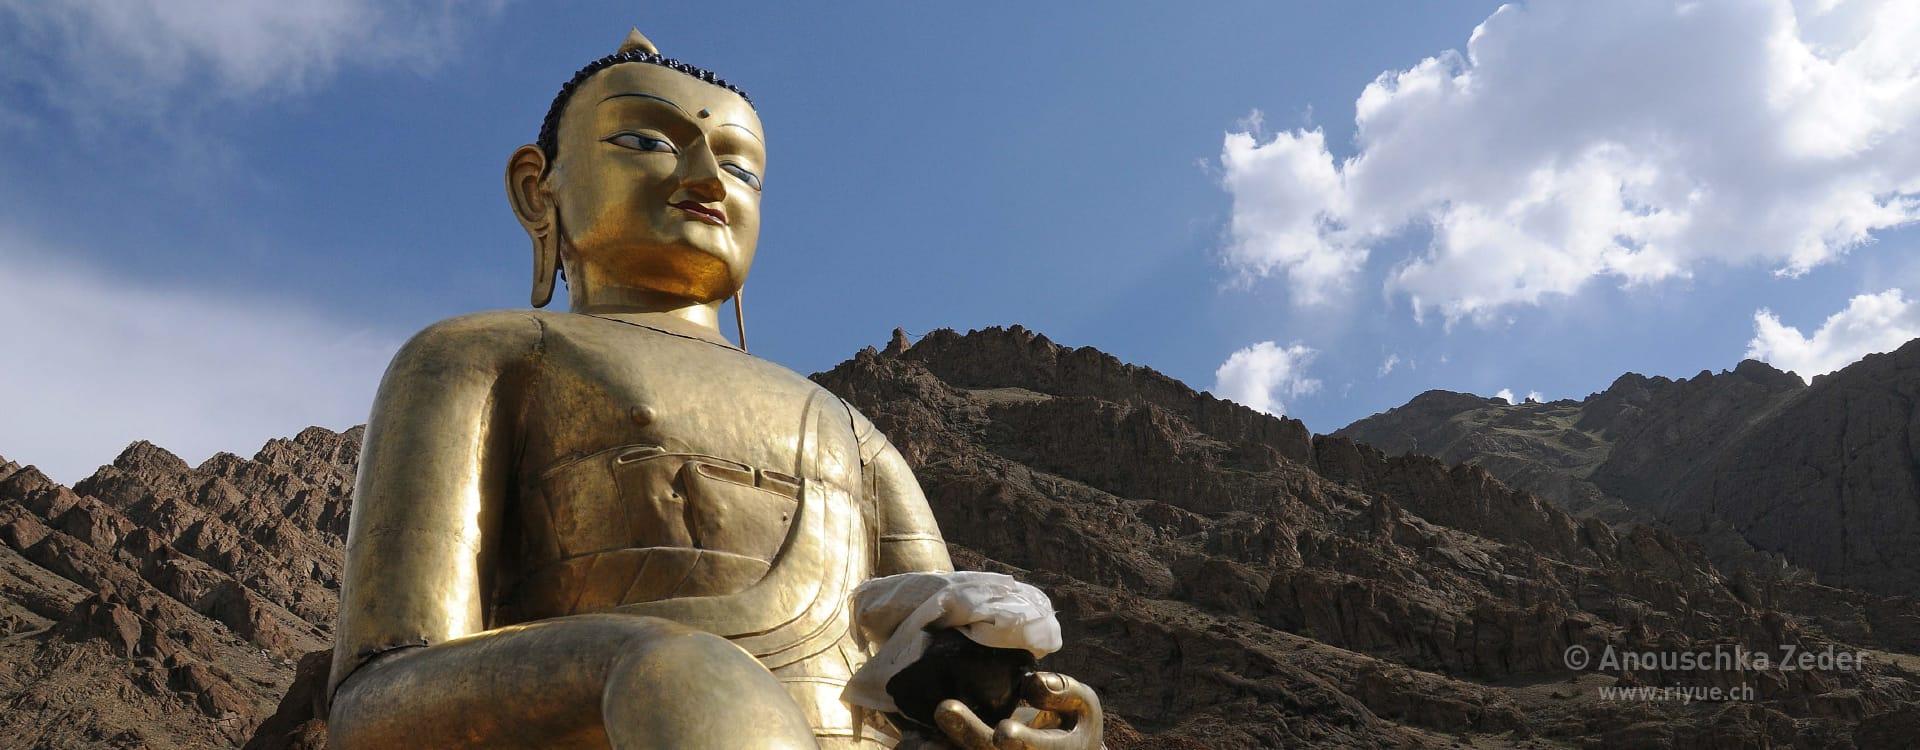 riyue – Schröpfen – Buddha Ladakh